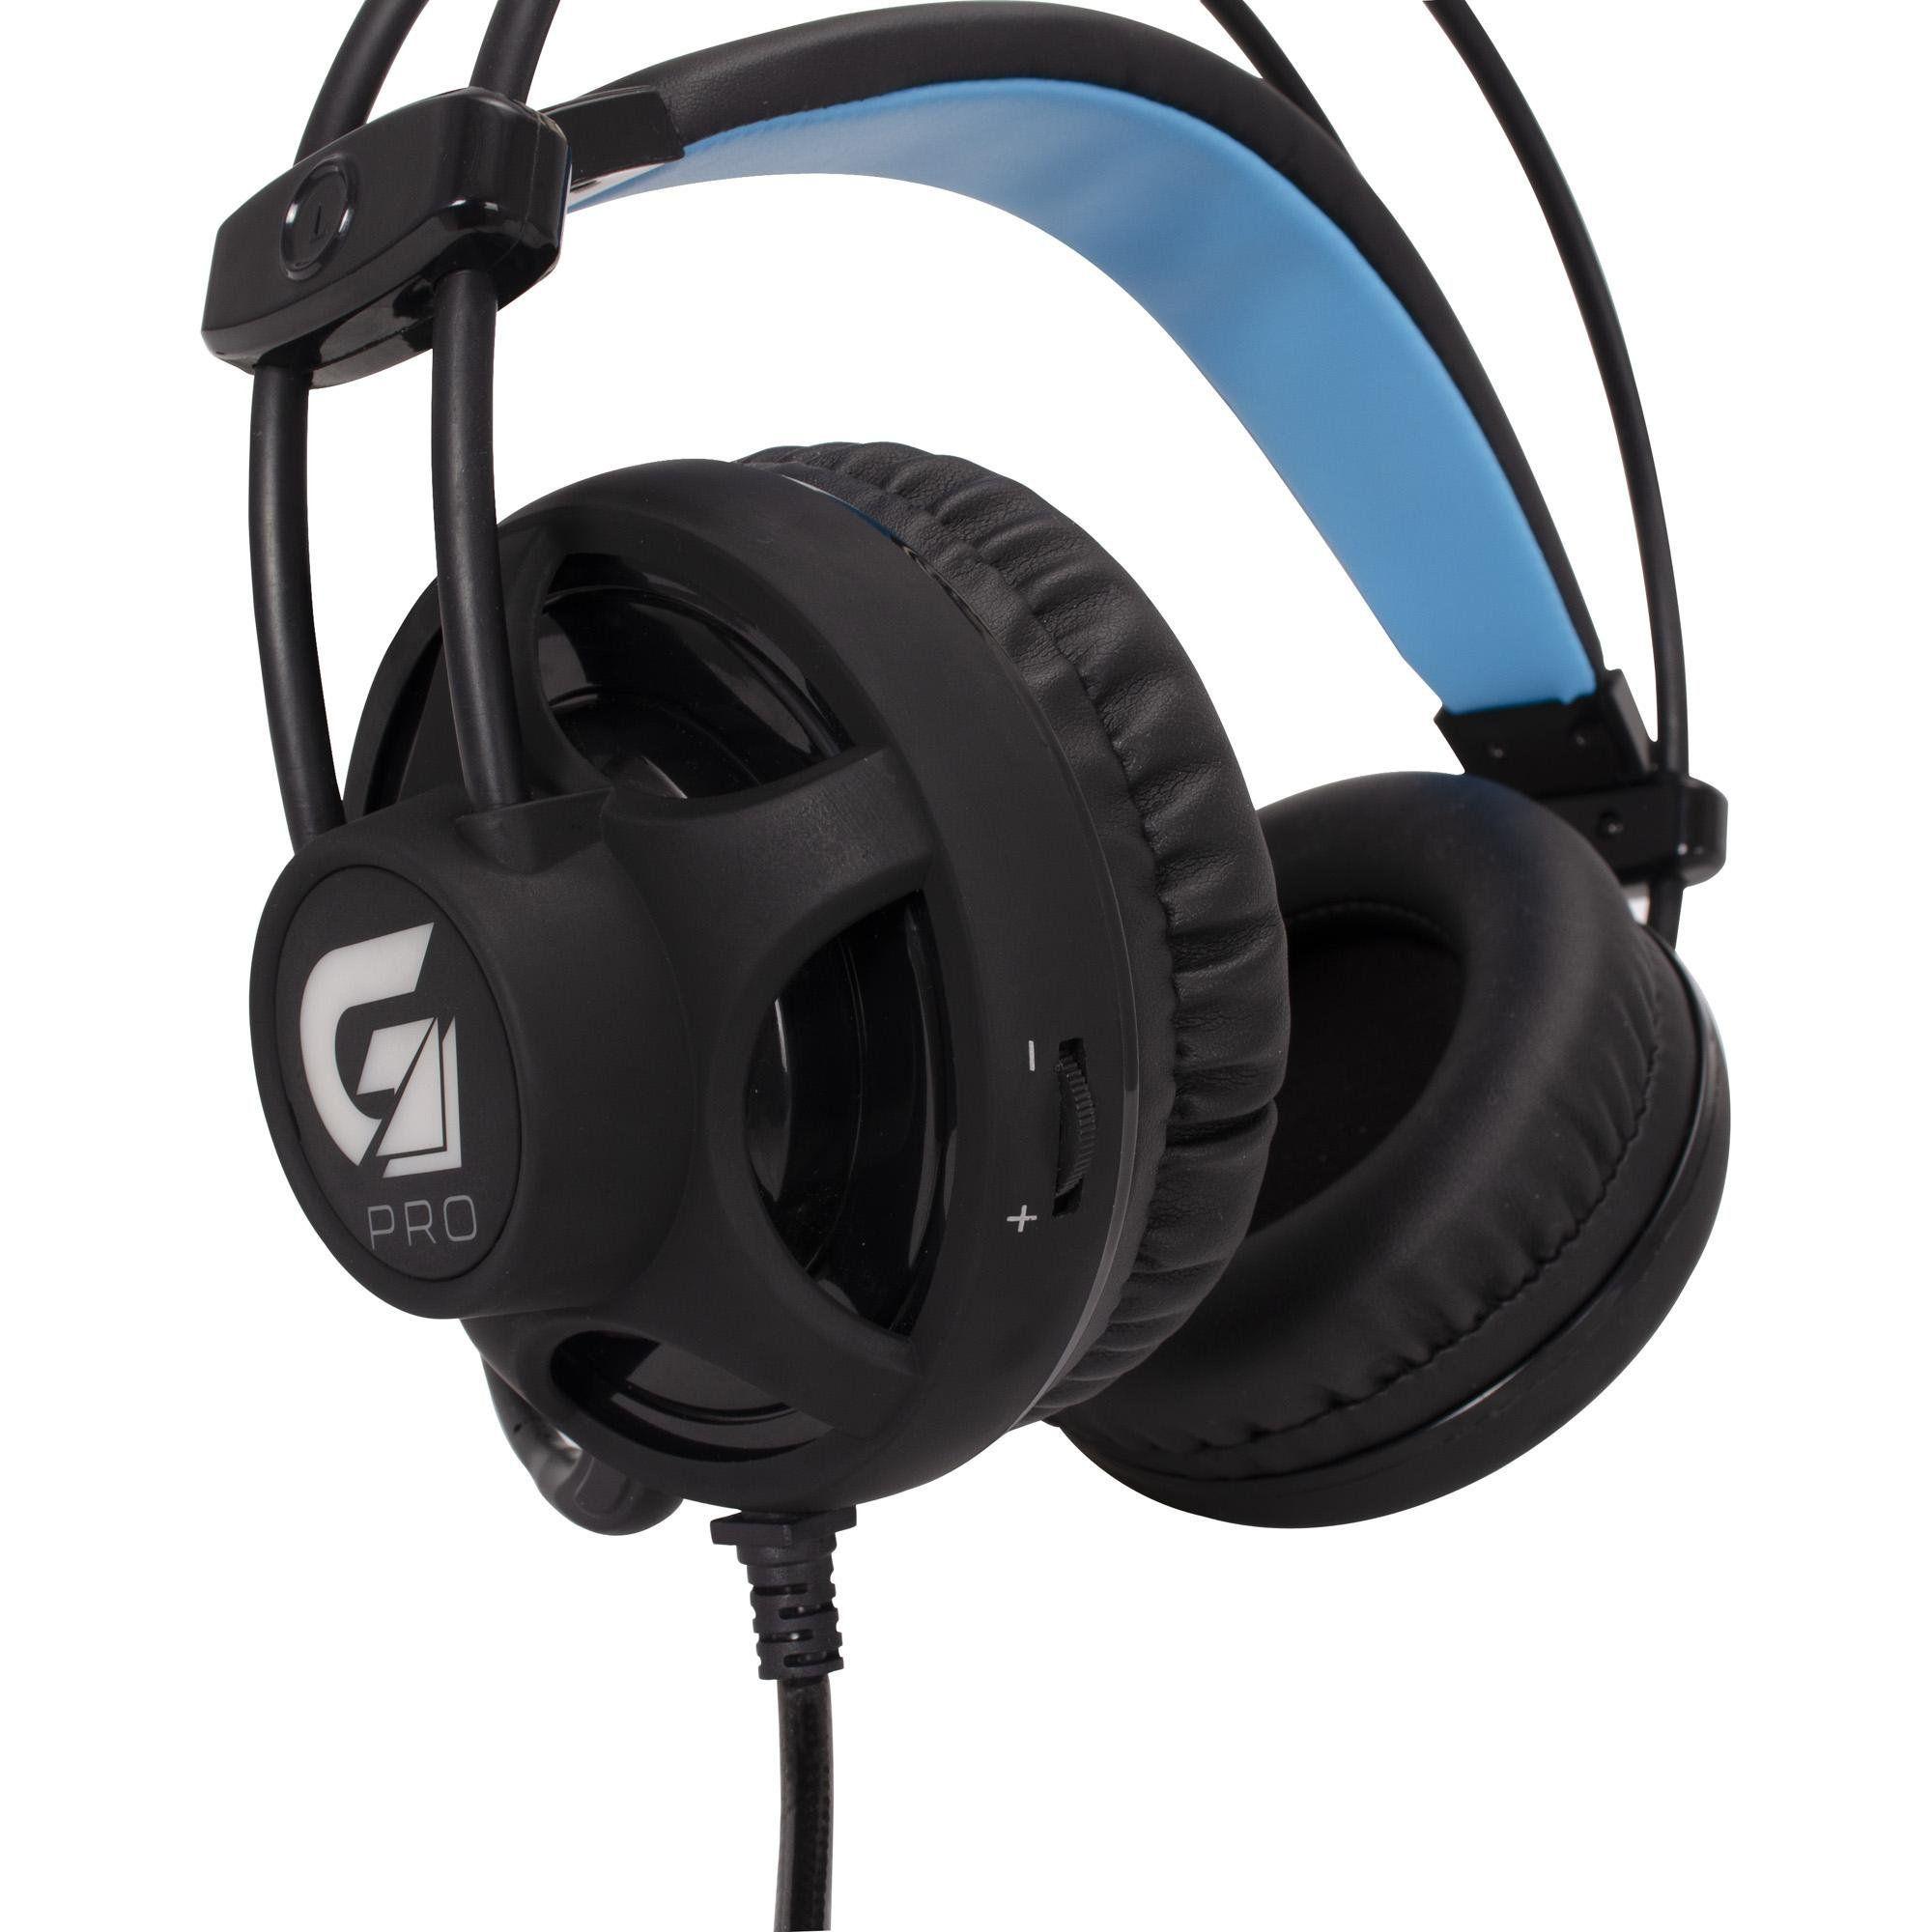 Headset Gamer Pro H2 com Led Azul Preto P2/USB  Fortrek